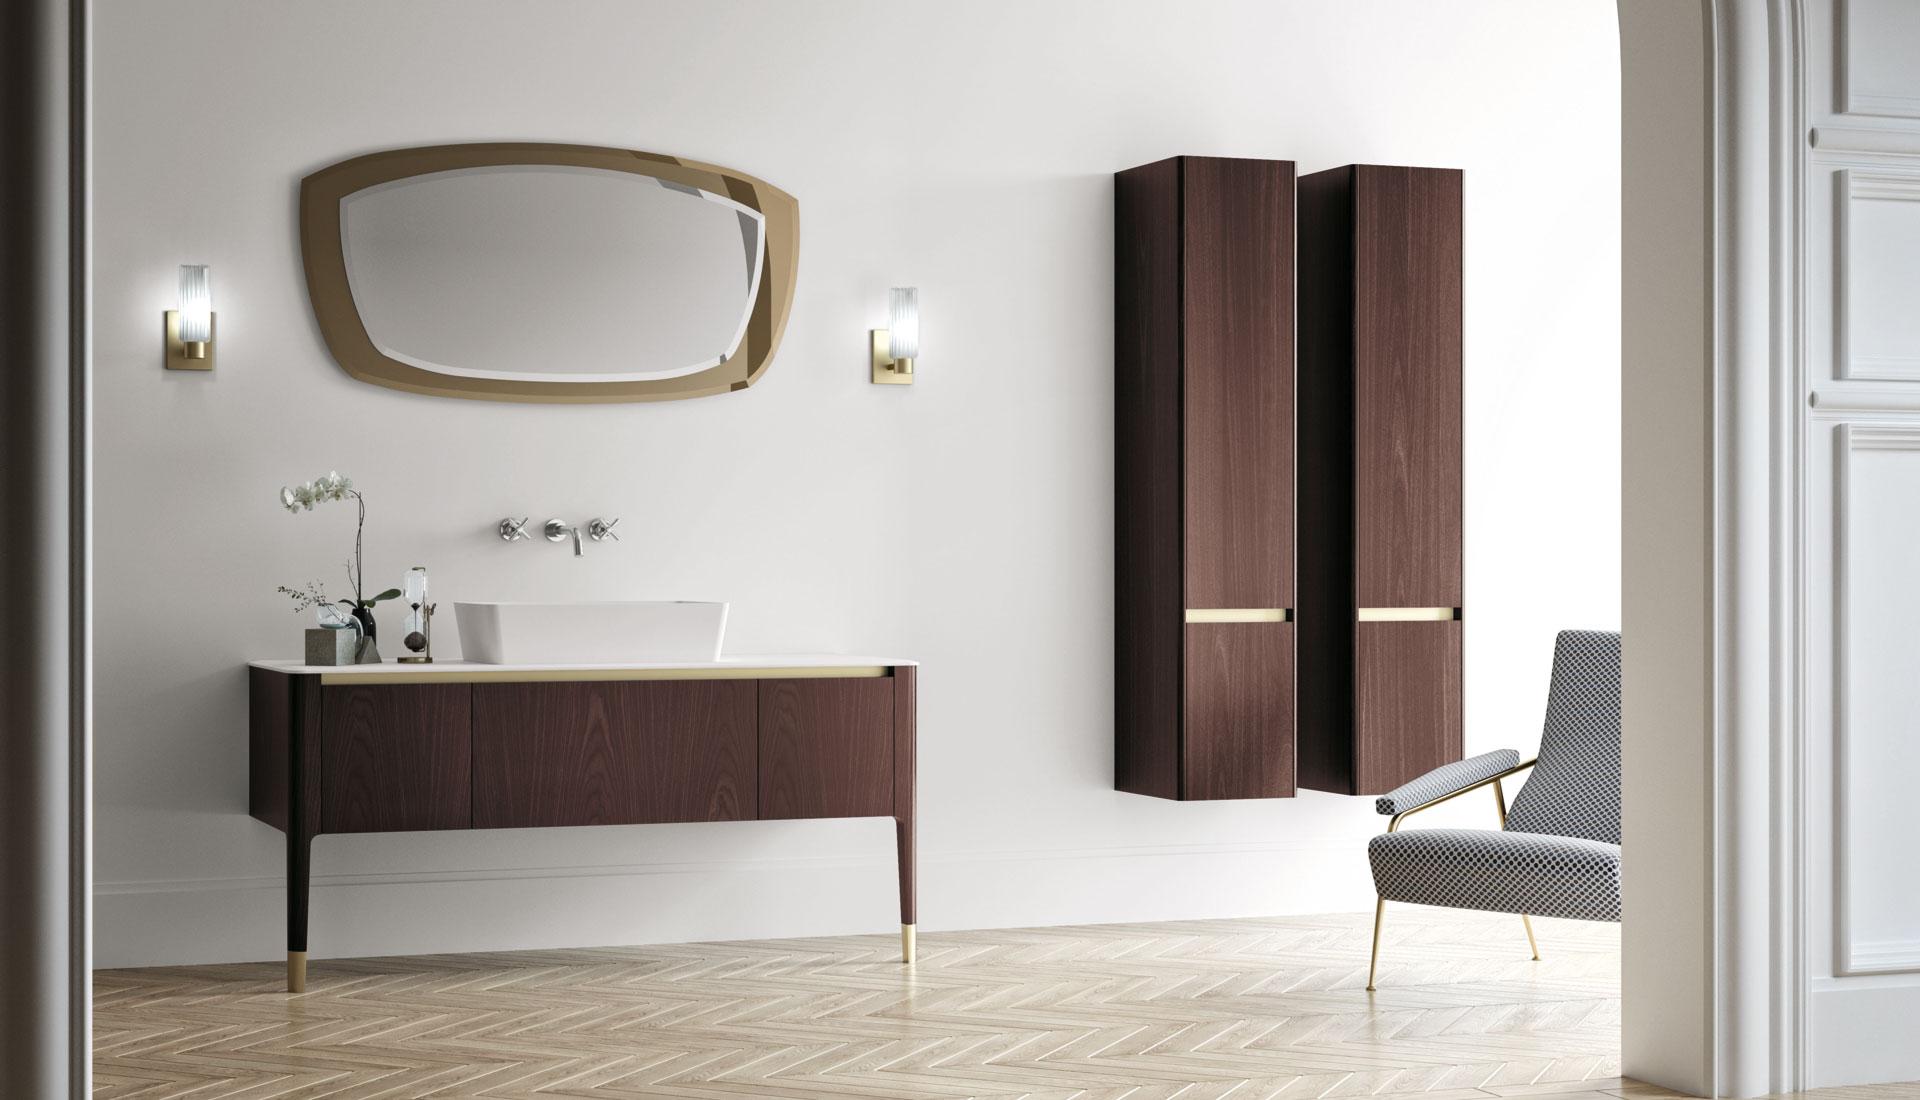 the art of bathroom - puntotre arredobagno - Arredo Bagno Sacile